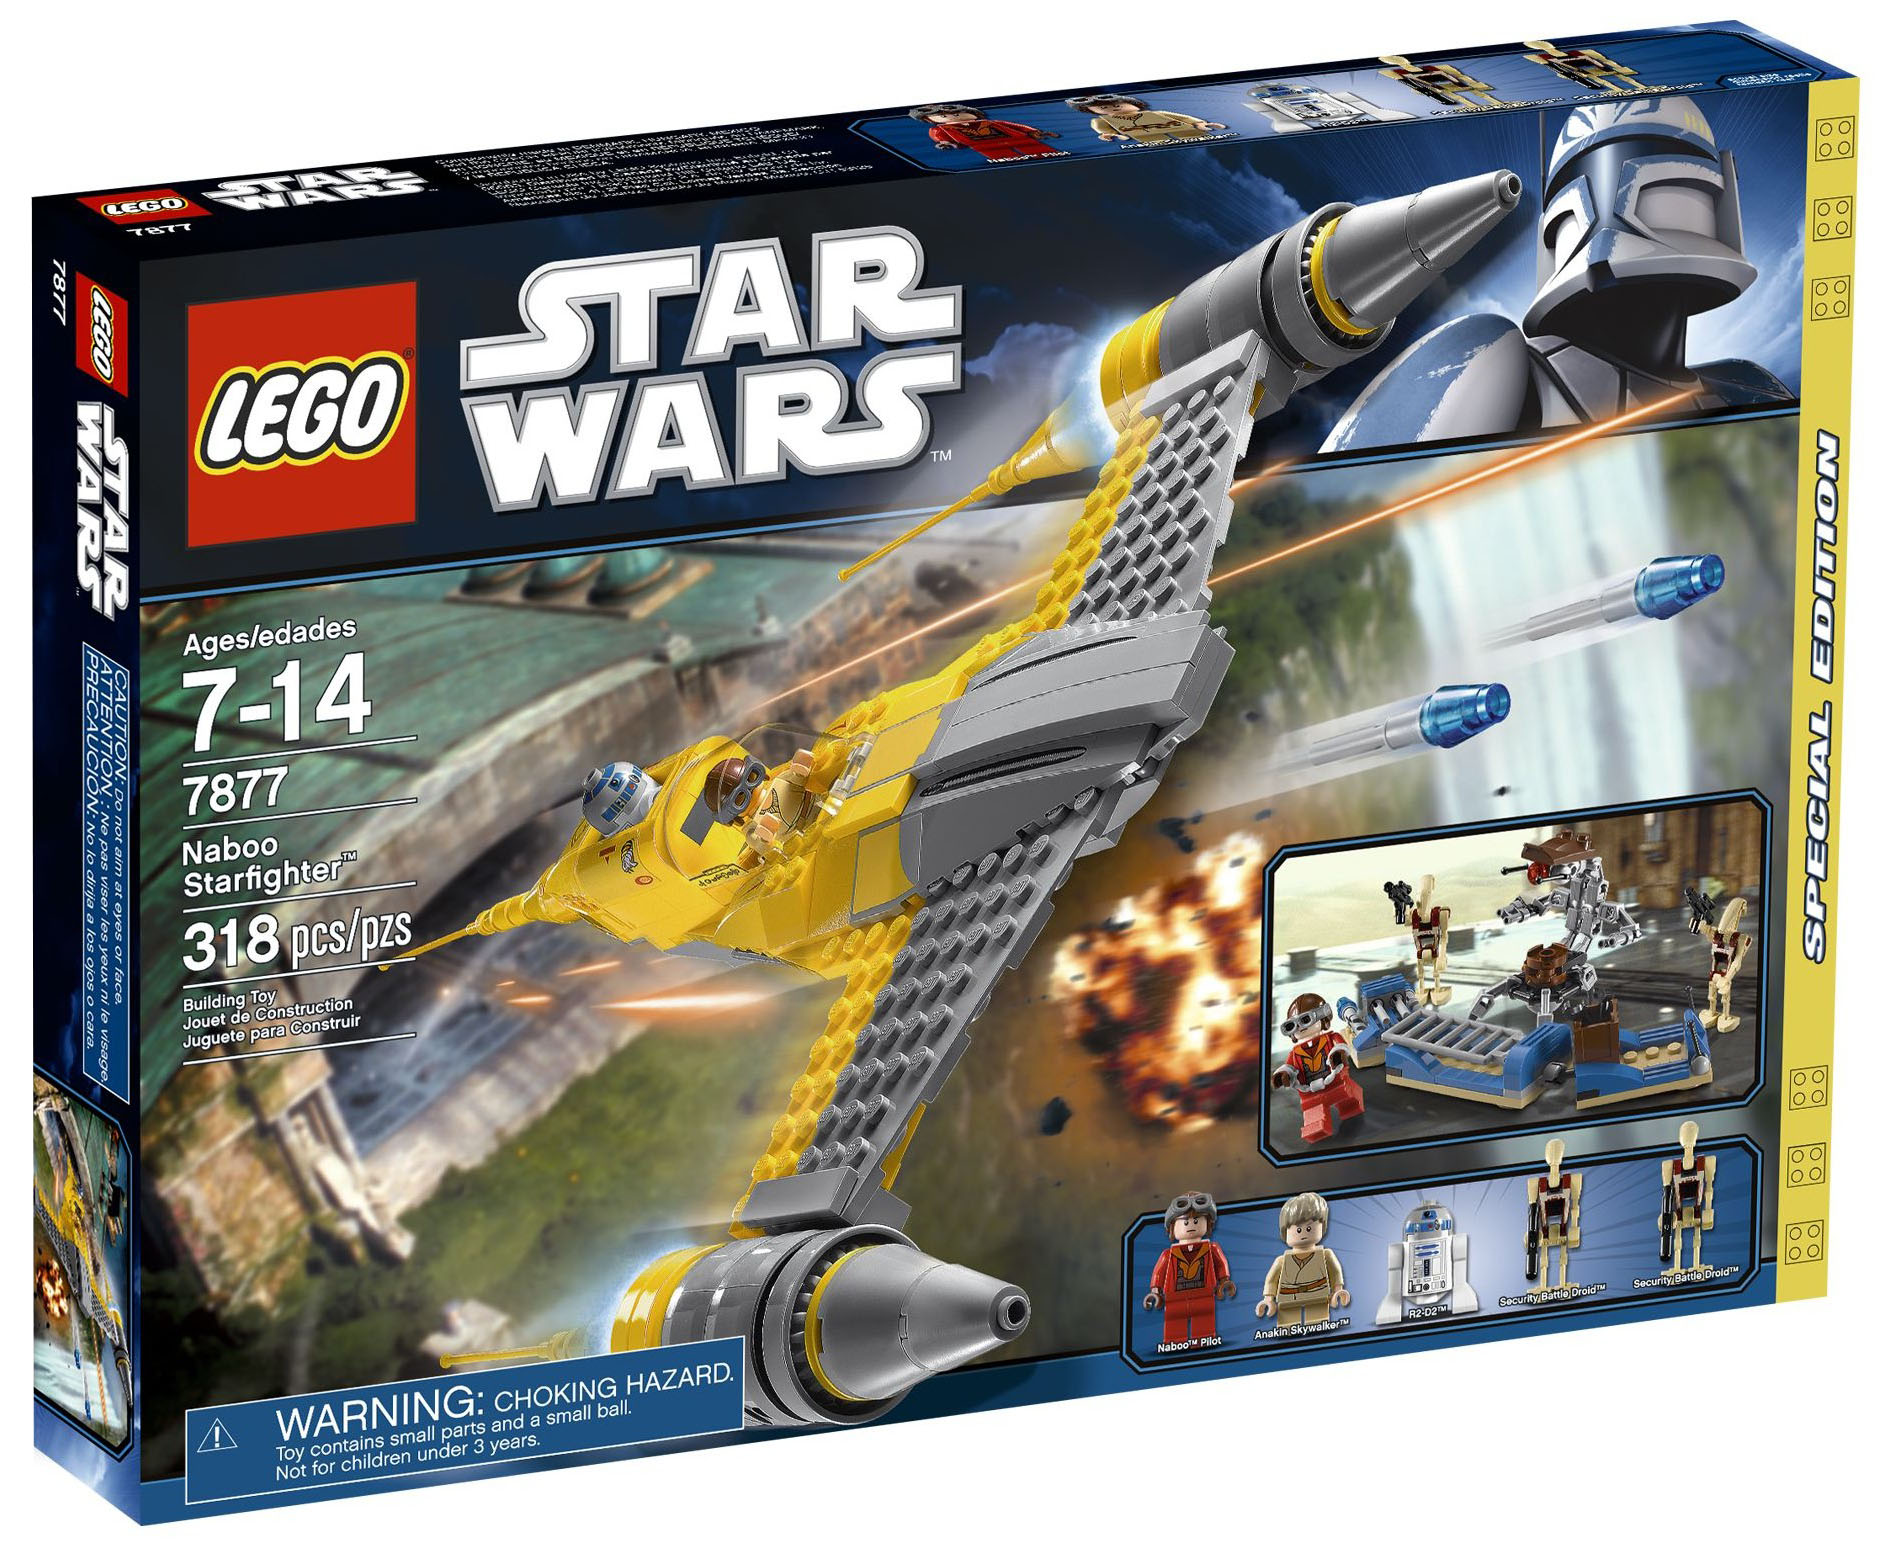 Lego star wars 7877 pas cher naboo starfighter - Lego star wars vaisseau droide ...